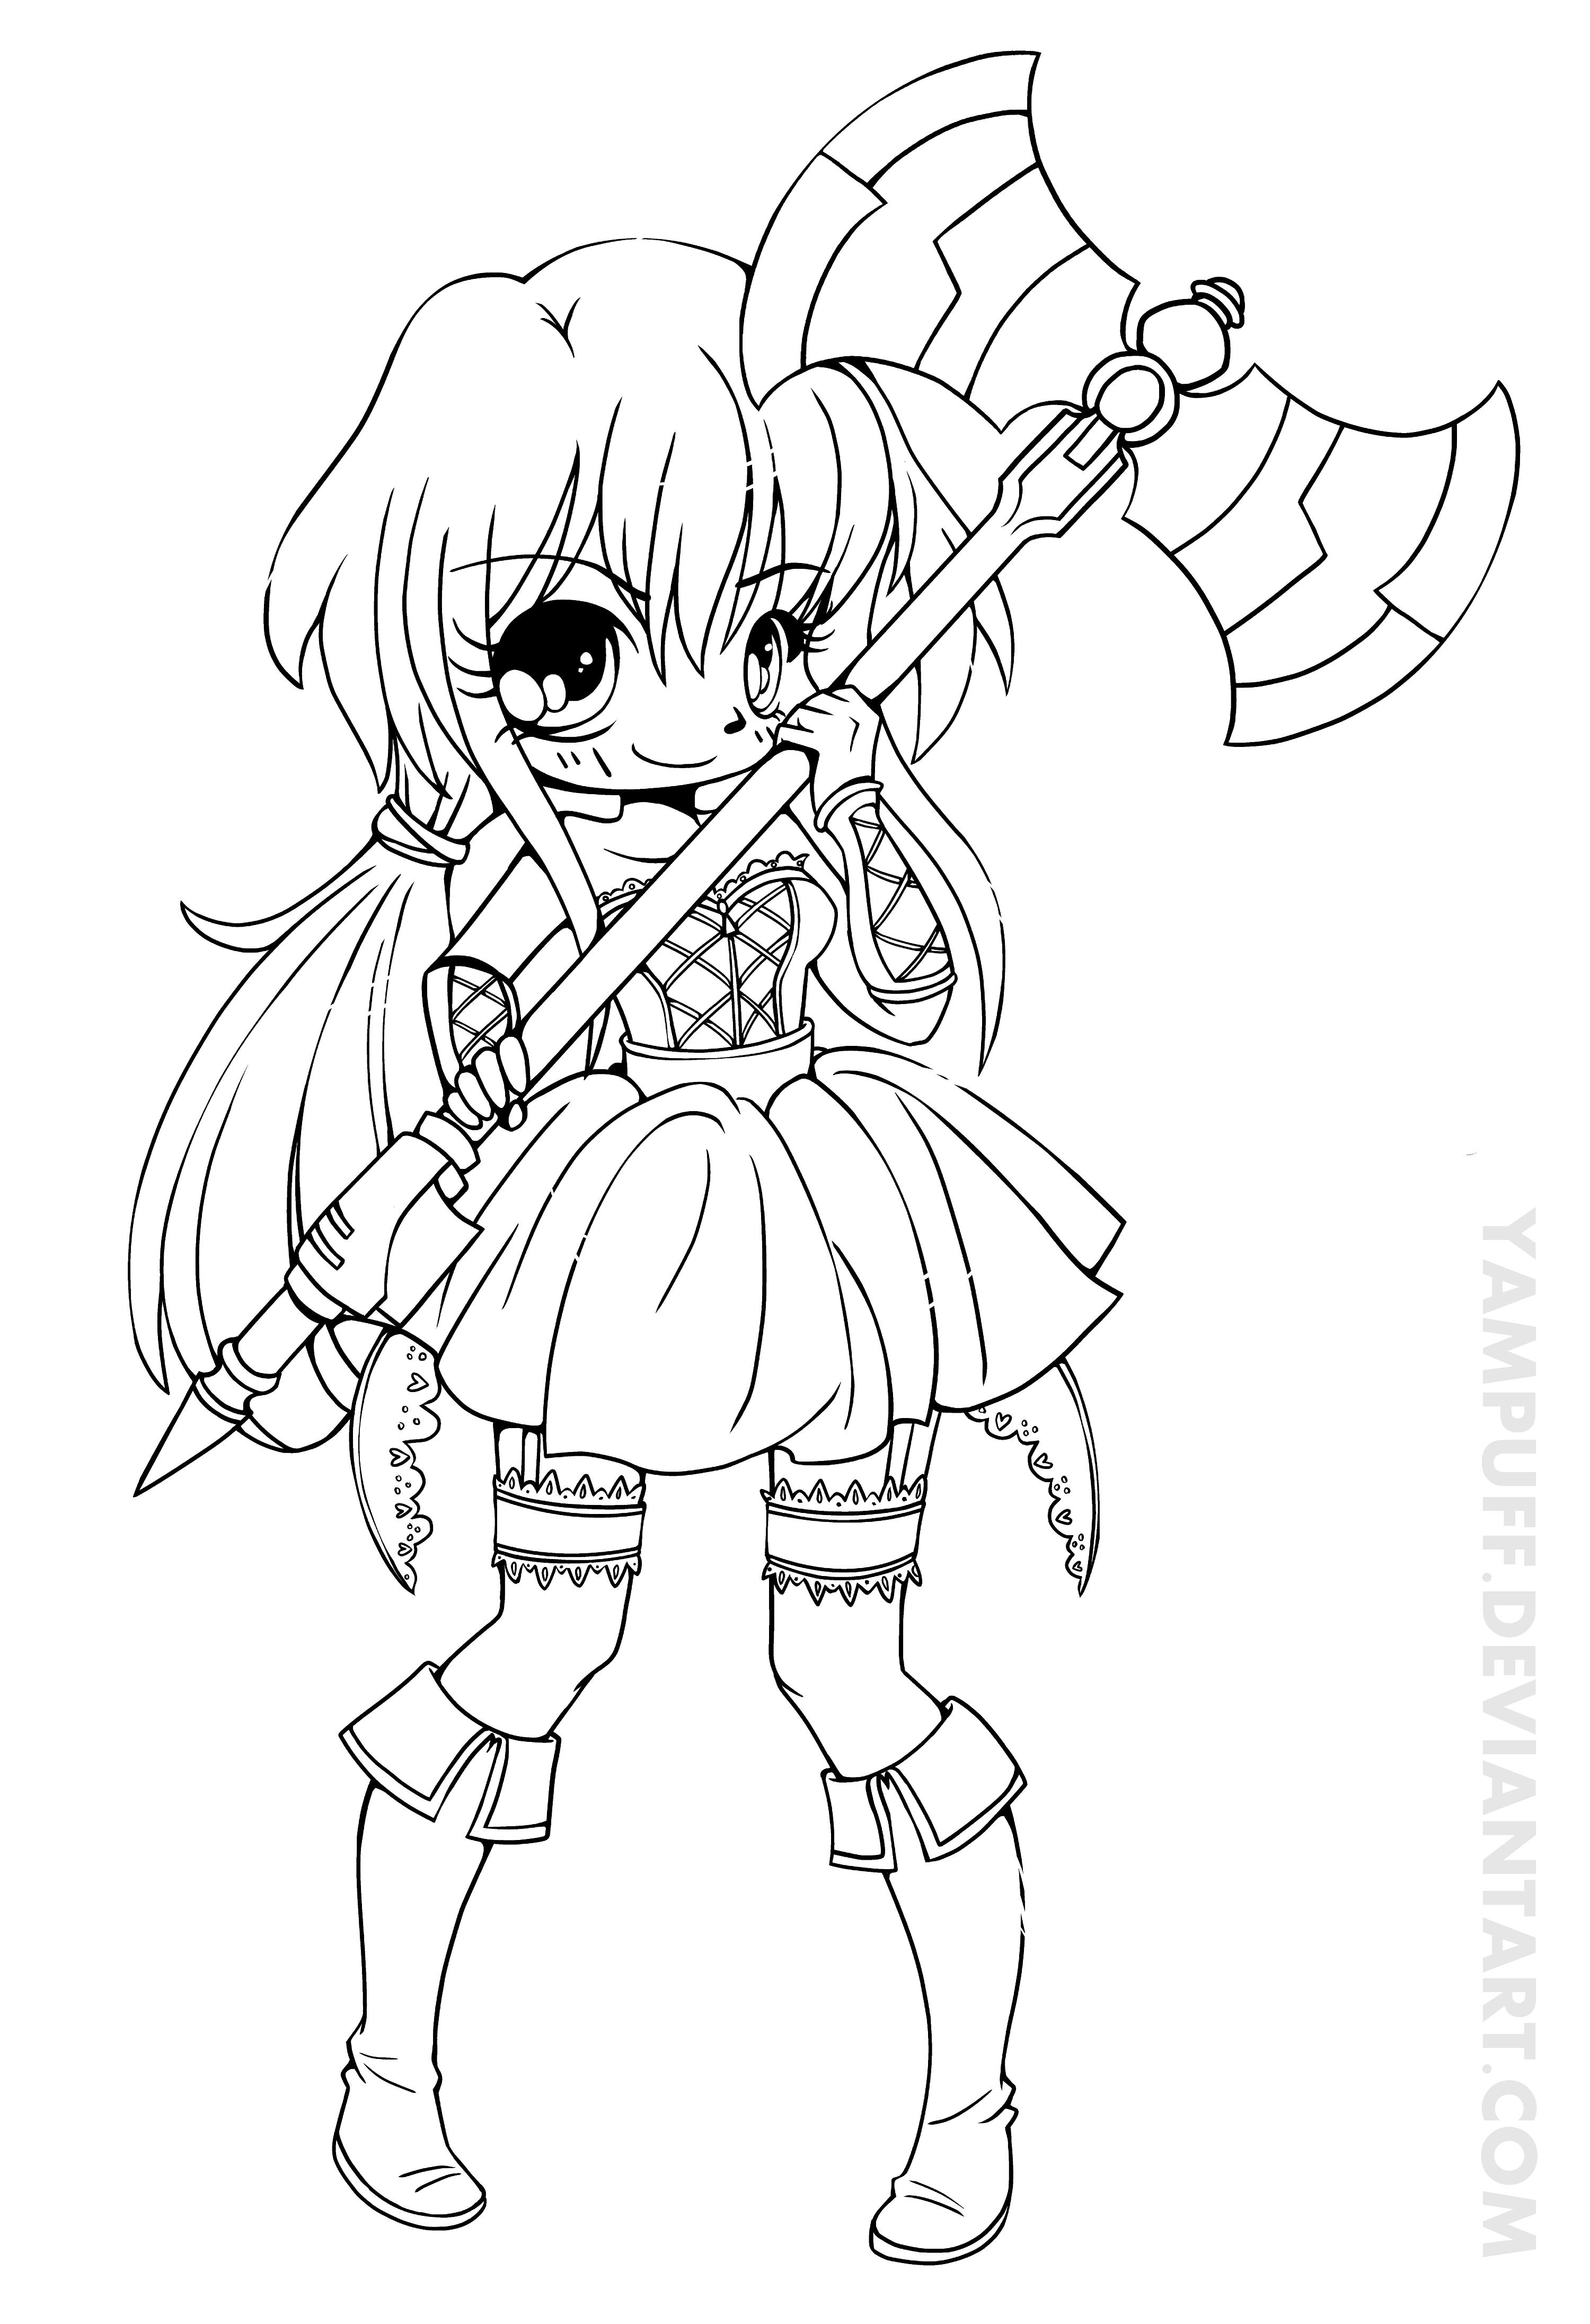 Soldat Coloriage Manga Coloriage Dessin Coloriage